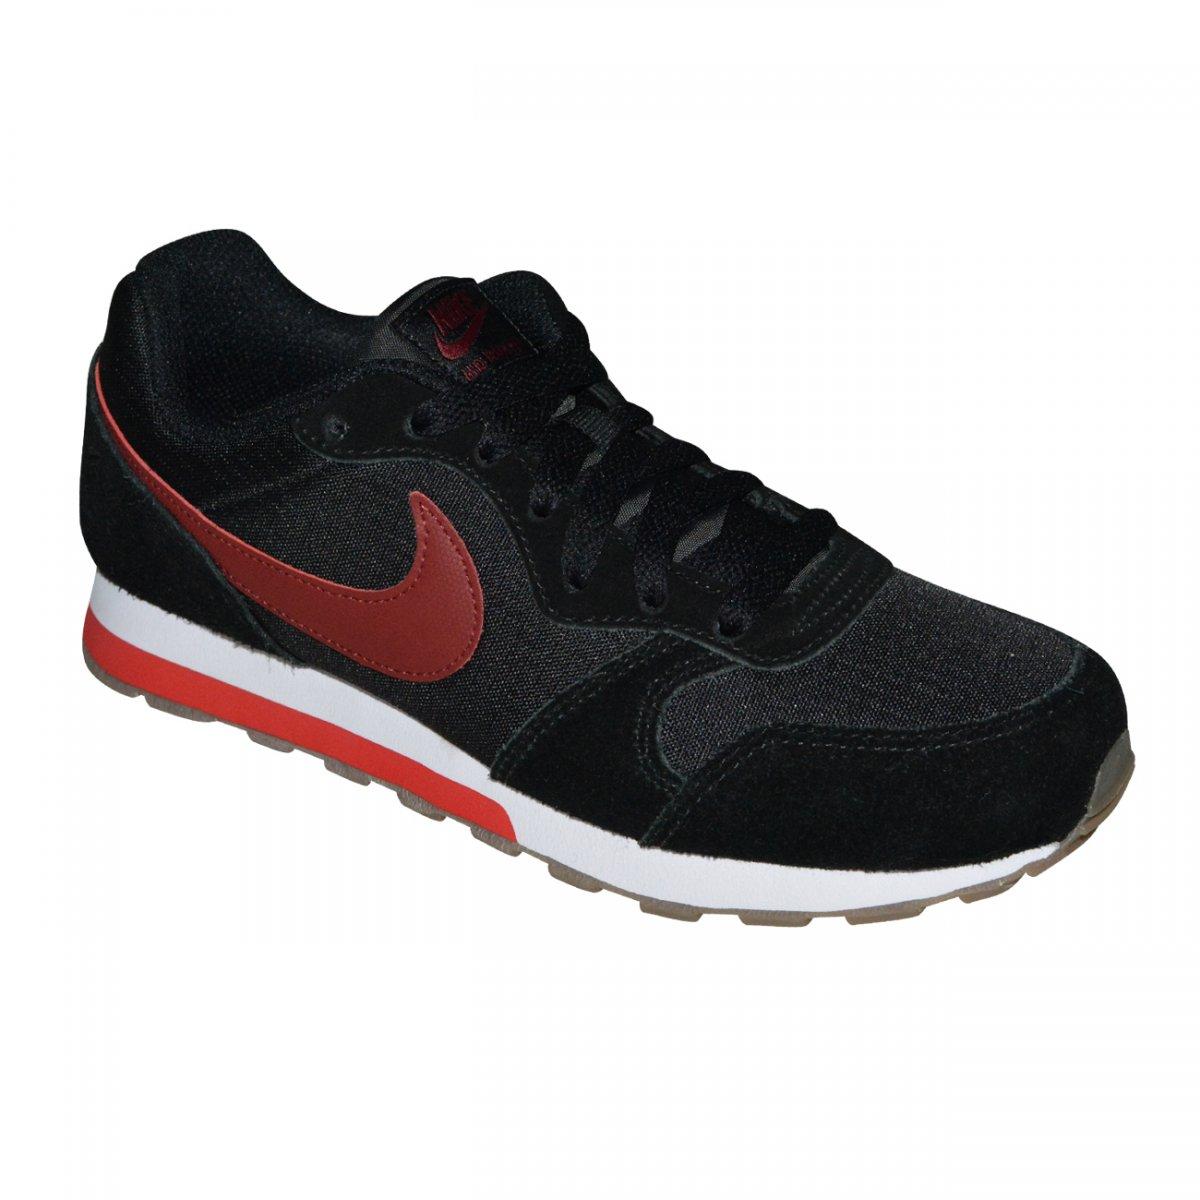 40b5cbb2c Tenis Nike Md Runner 2 Juvenil 807316 010 - Preto bordô - Chuteira Nike